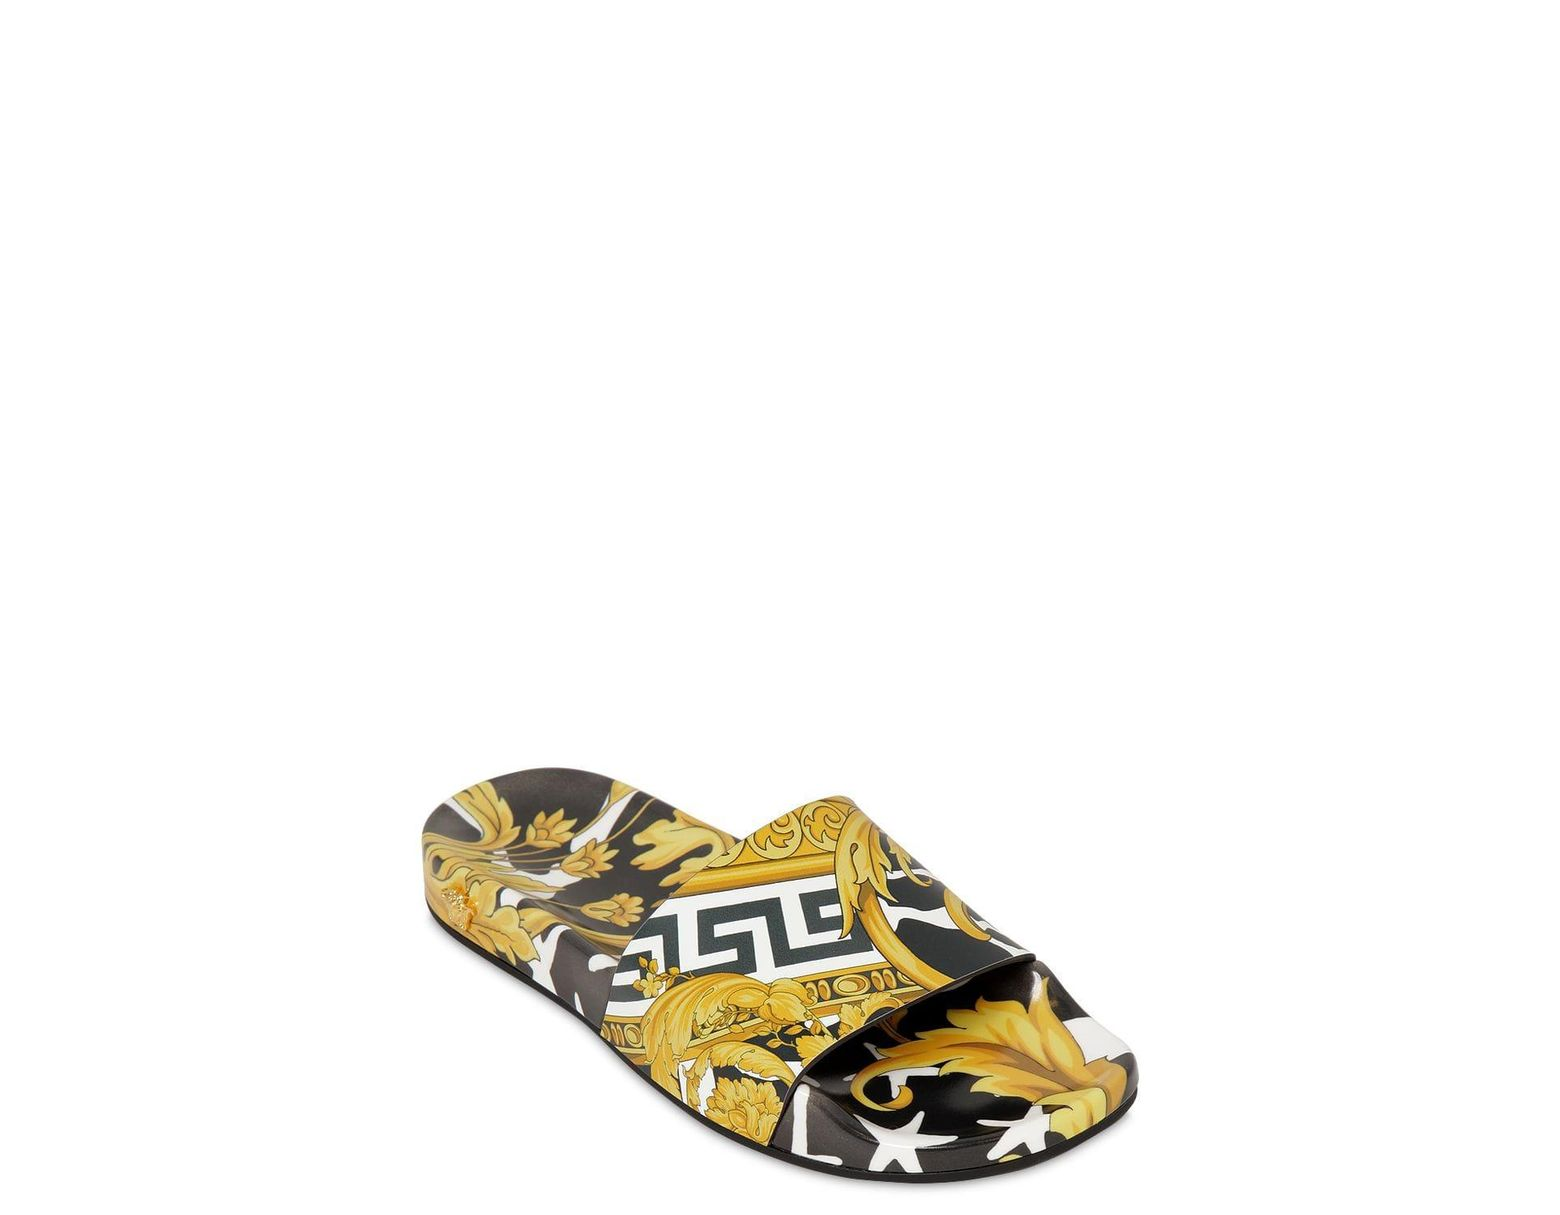 893612068c4 Versace 20mm Printed Rubber Slide Sandals - Lyst